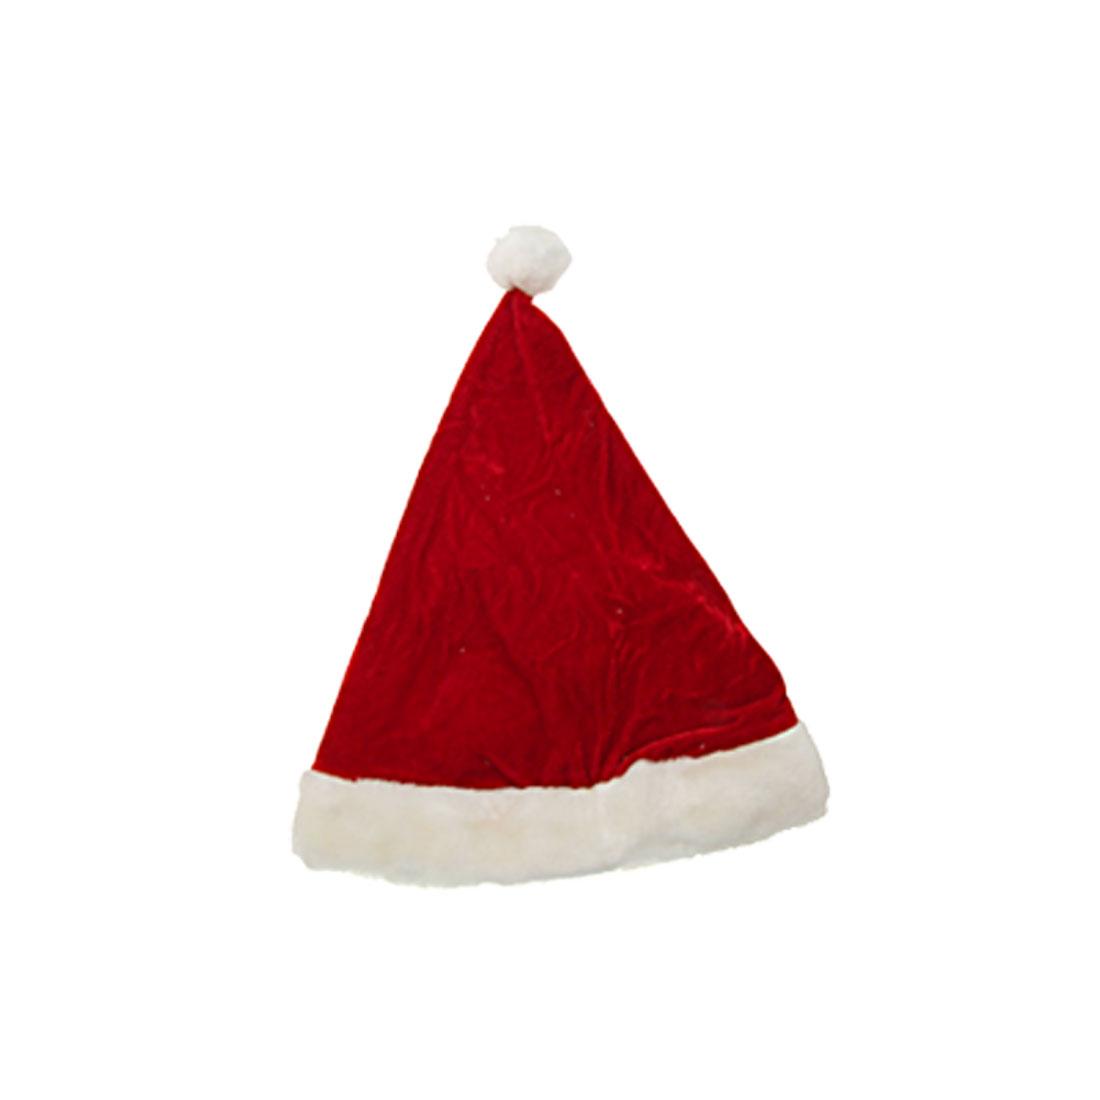 Merry Christmas Red Santa Claus Holiday Xmas Hat Cap